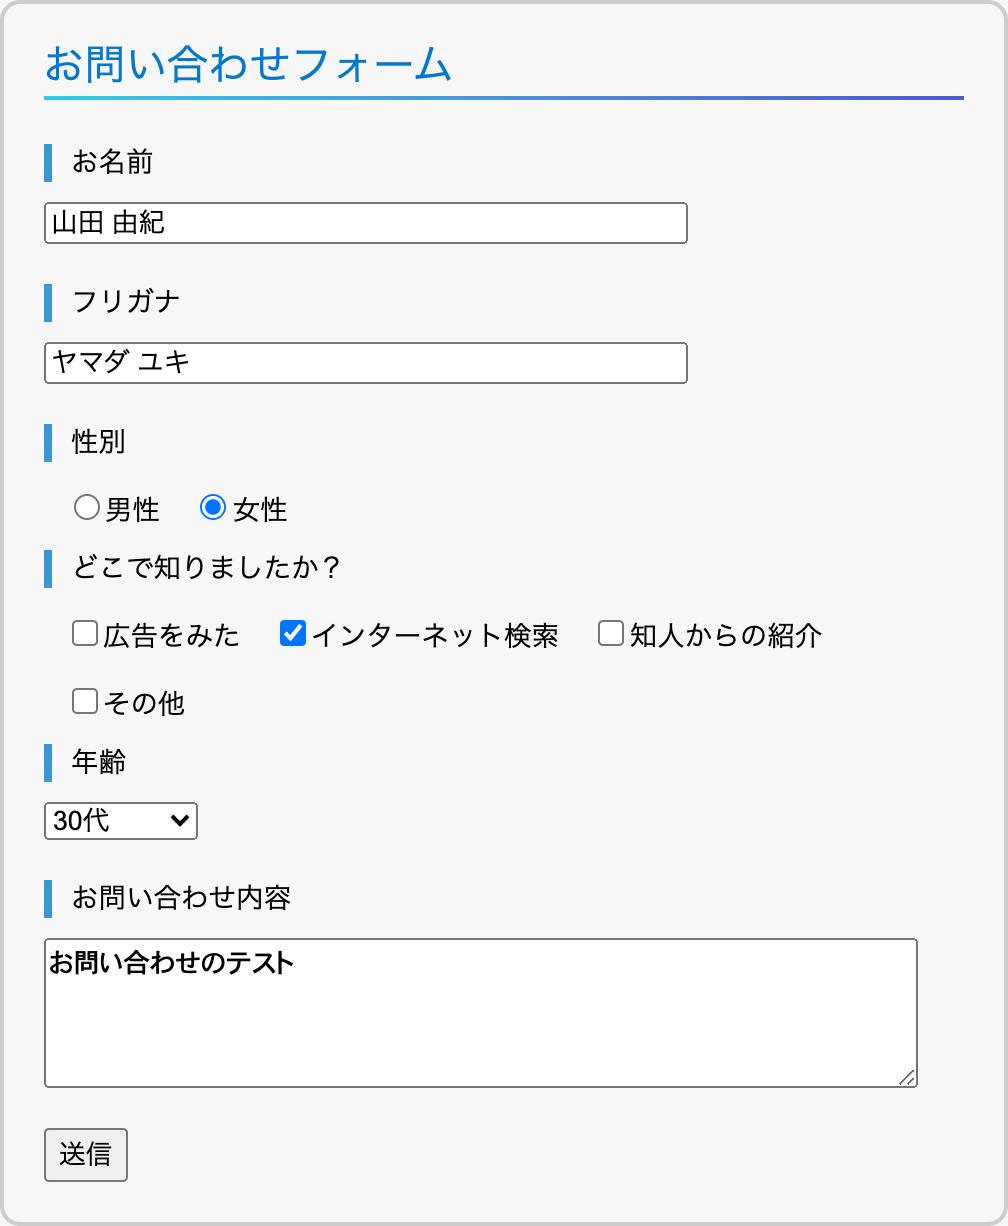 readonly属性を設定したフォームの表示例